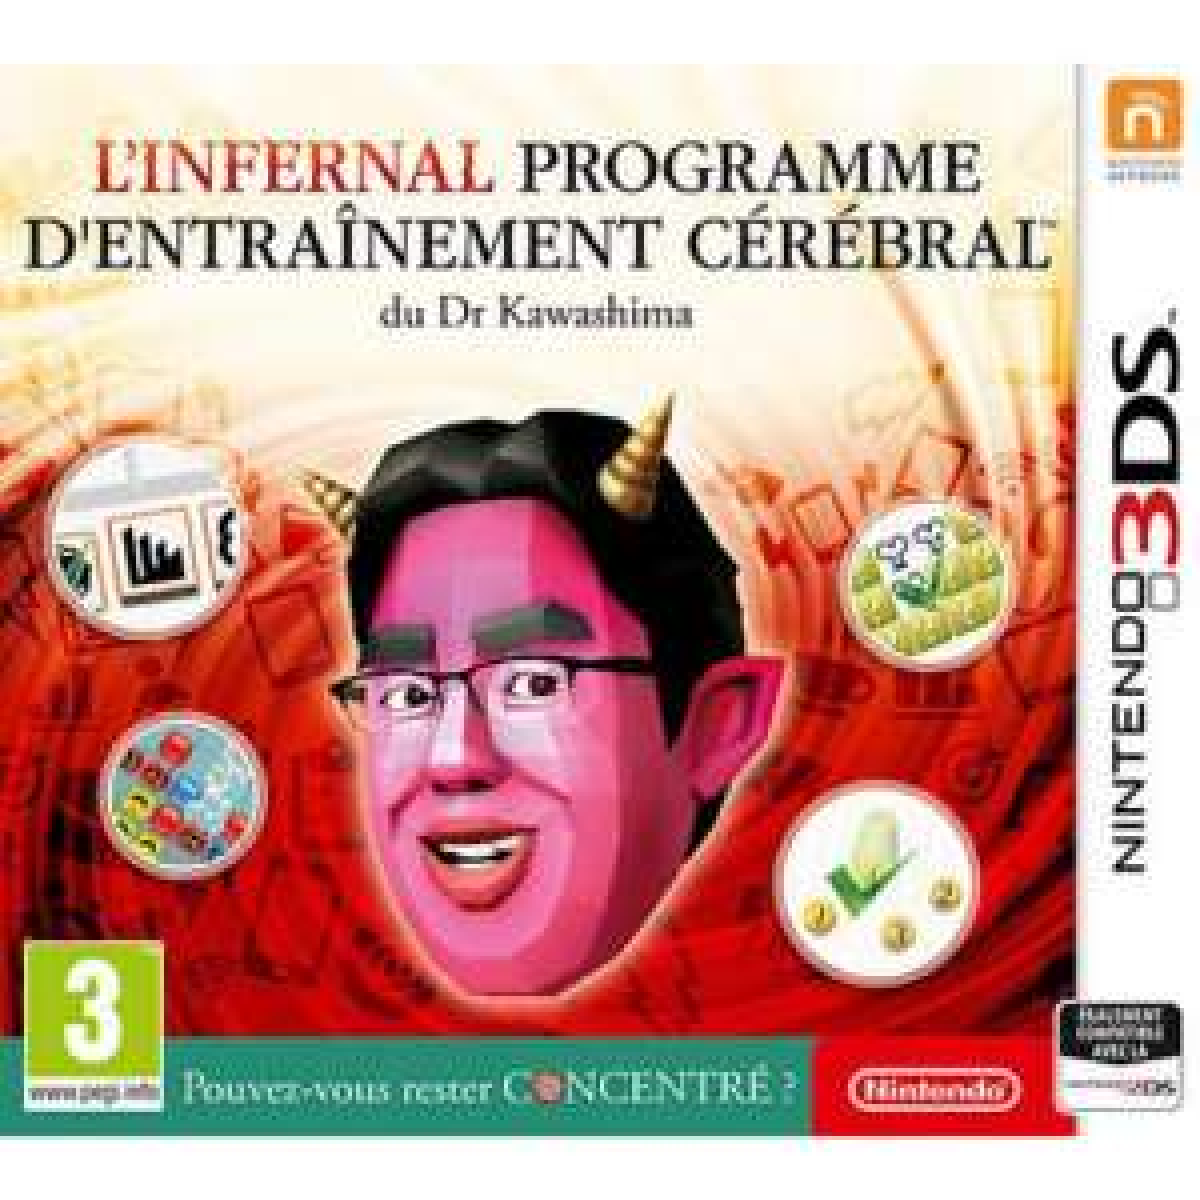 L'infernal programme d'entraînement cérébral du Dr Kawashima sur Nintendo 3DS